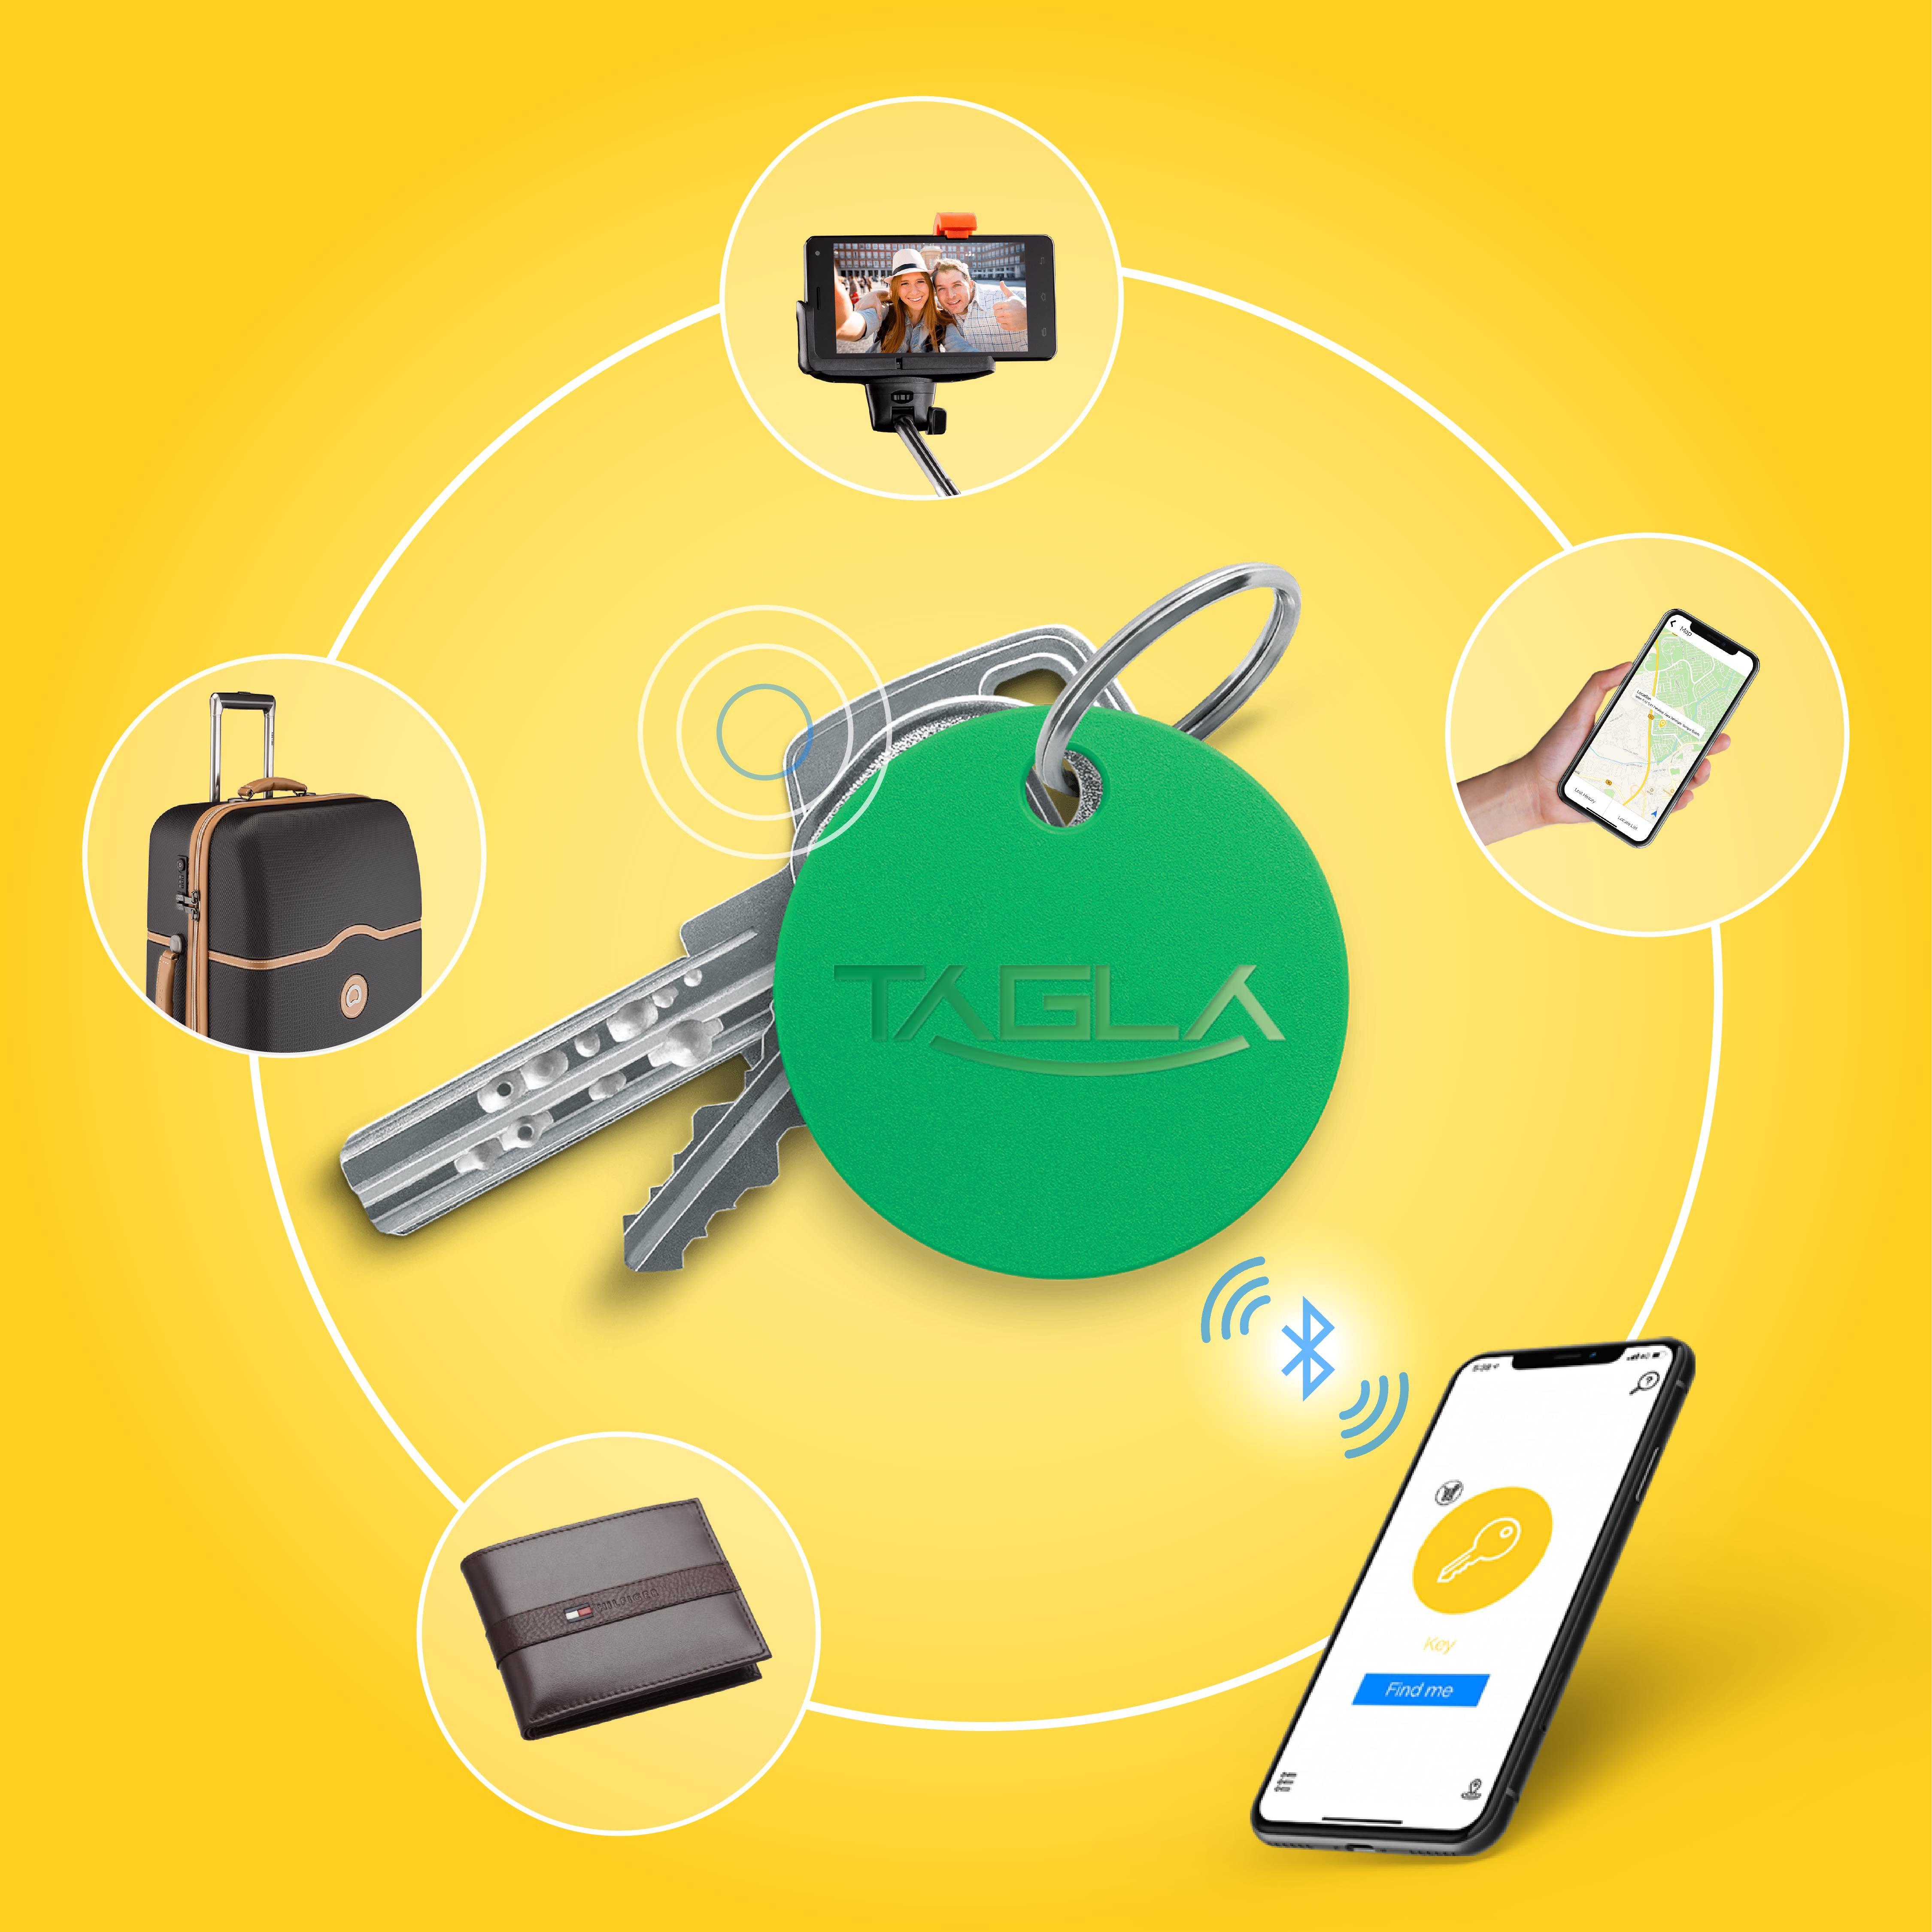 TAG La V2 Bluetooth Tracker Key Finder Item Finder Anti lost alarm device for Security-Key Locator, Wallet Tracker, Phone Finder, Selfie Remote (Green)